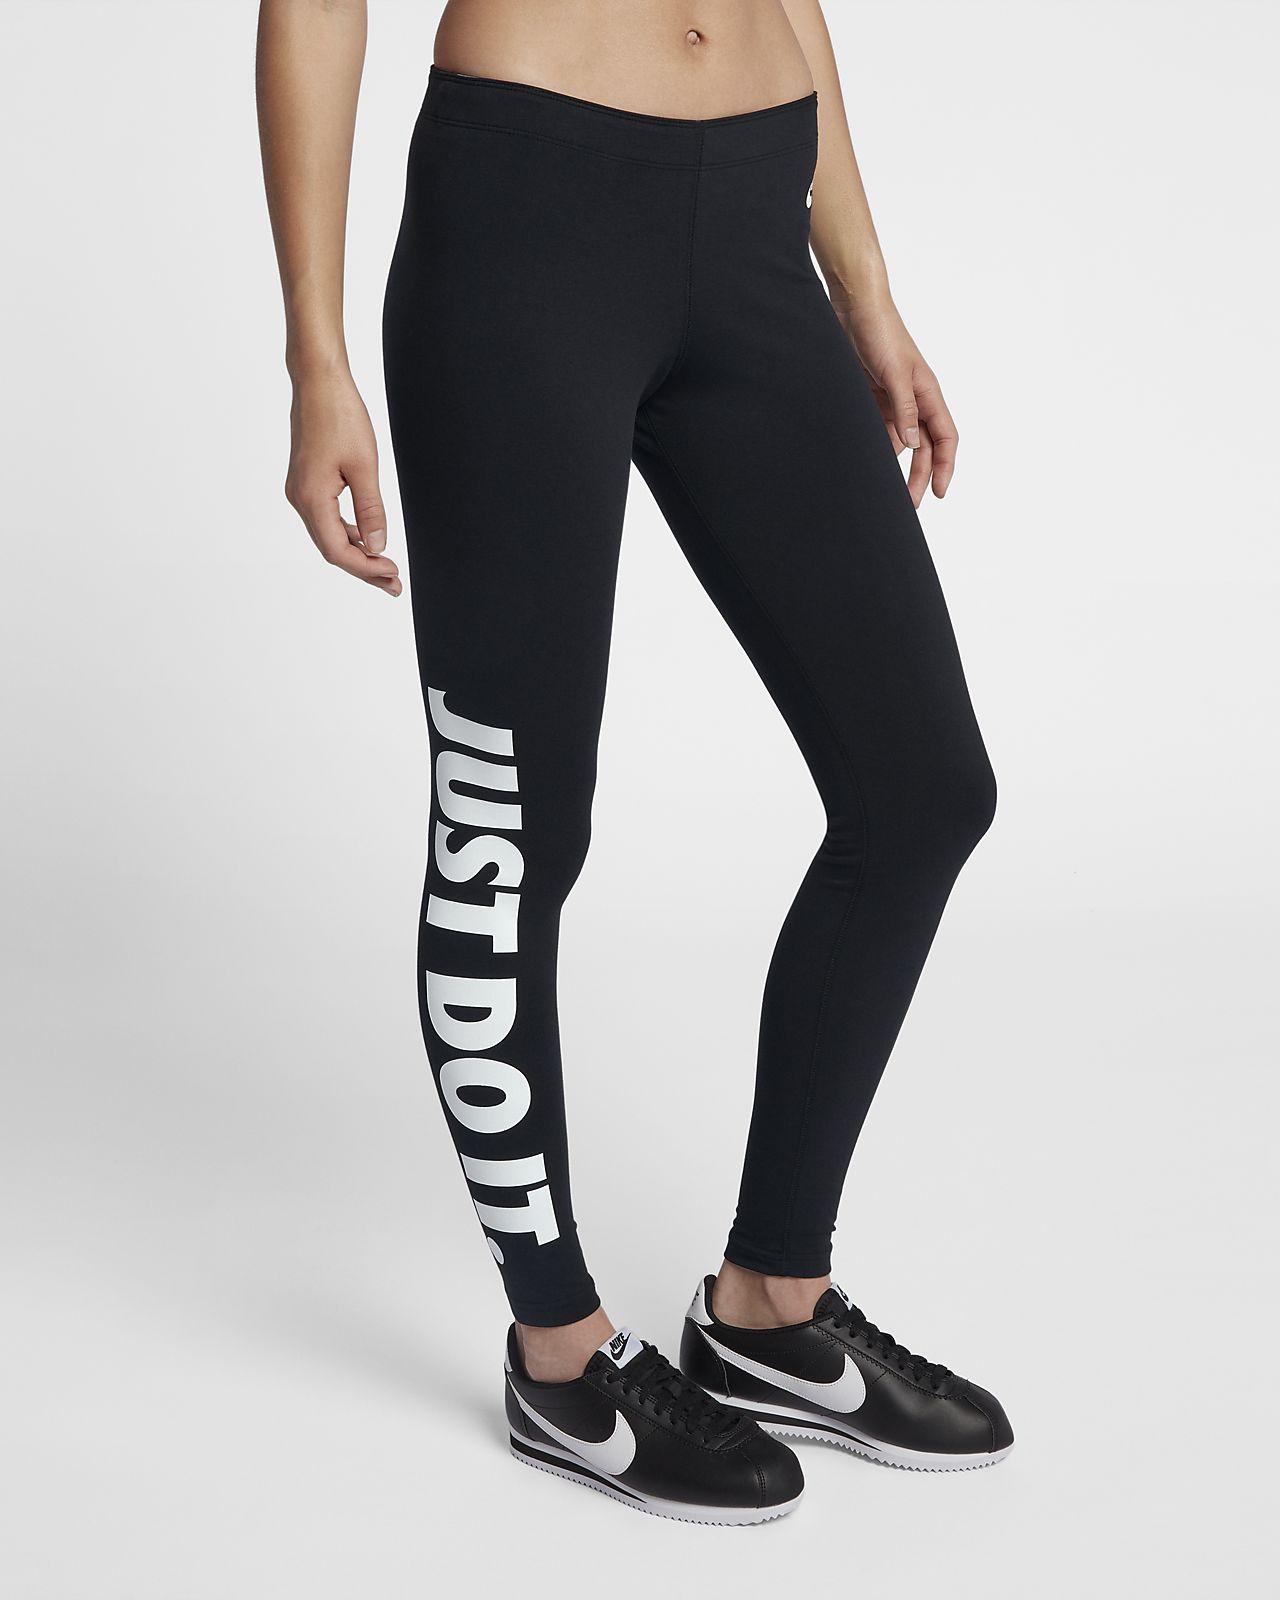 140a4c72432b4 Nike Sportswear Leg-A-See Women's Leggings. Nike.com SI